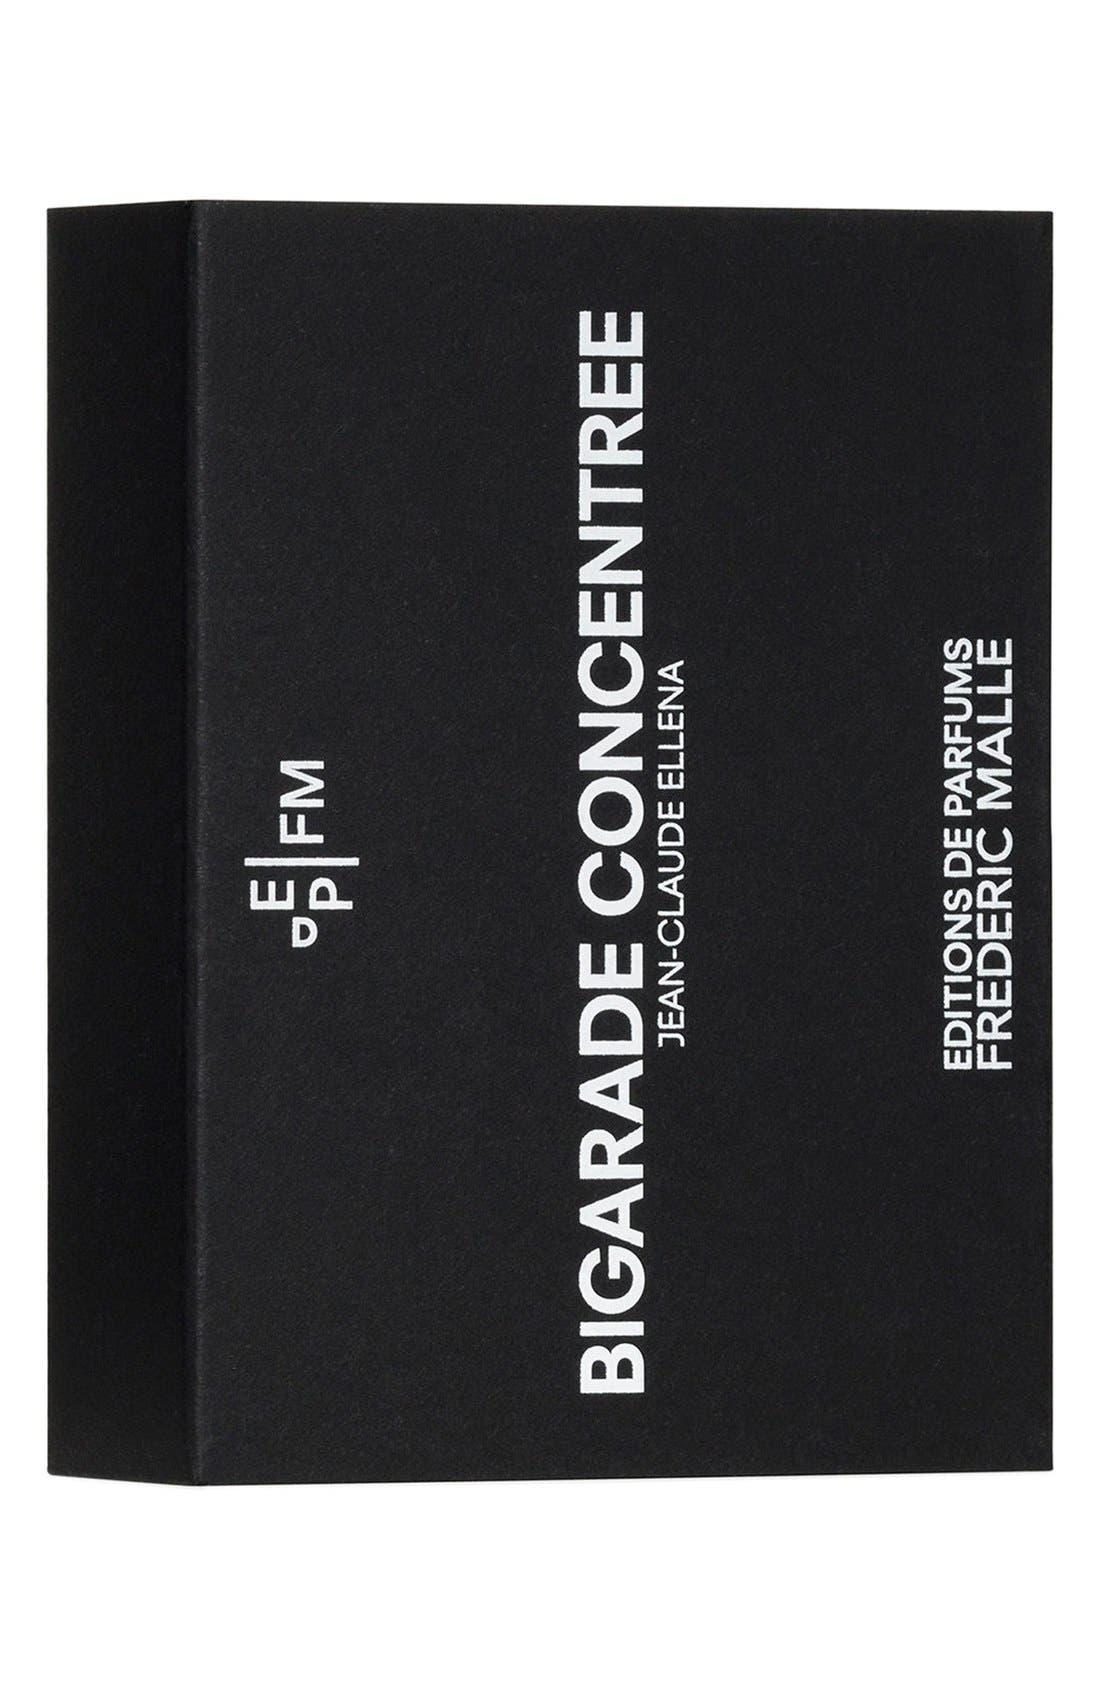 Editions de Parfums Frédéric Malle Bigarade Concentrée Parfum Spray Travel Trio,                             Alternate thumbnail 5, color,                             NO COLOR